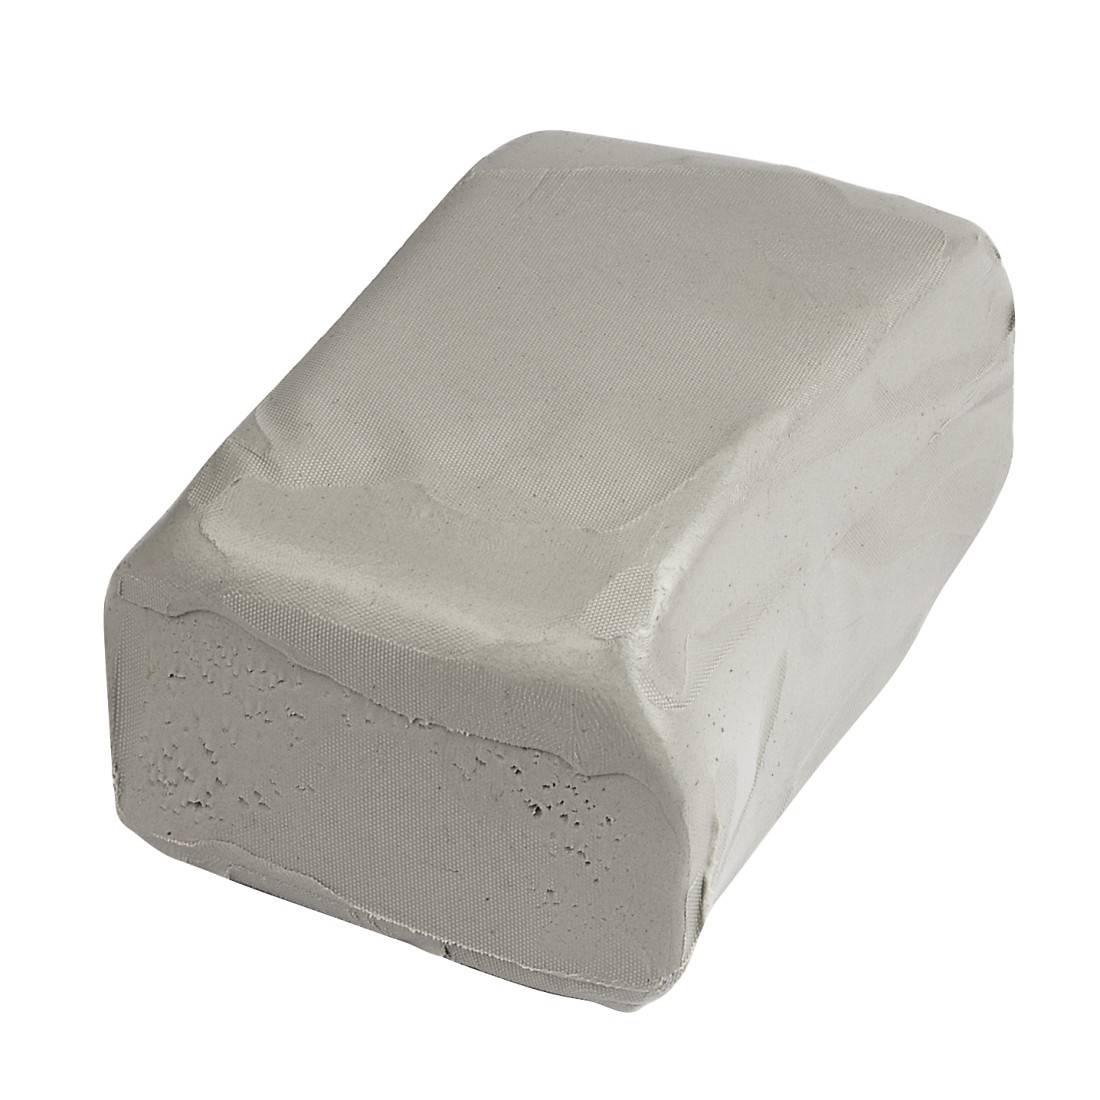 Fieltro fino blanco 21x29,7 cms Fieltro fino 210*297 mm 10 hojas 10H.